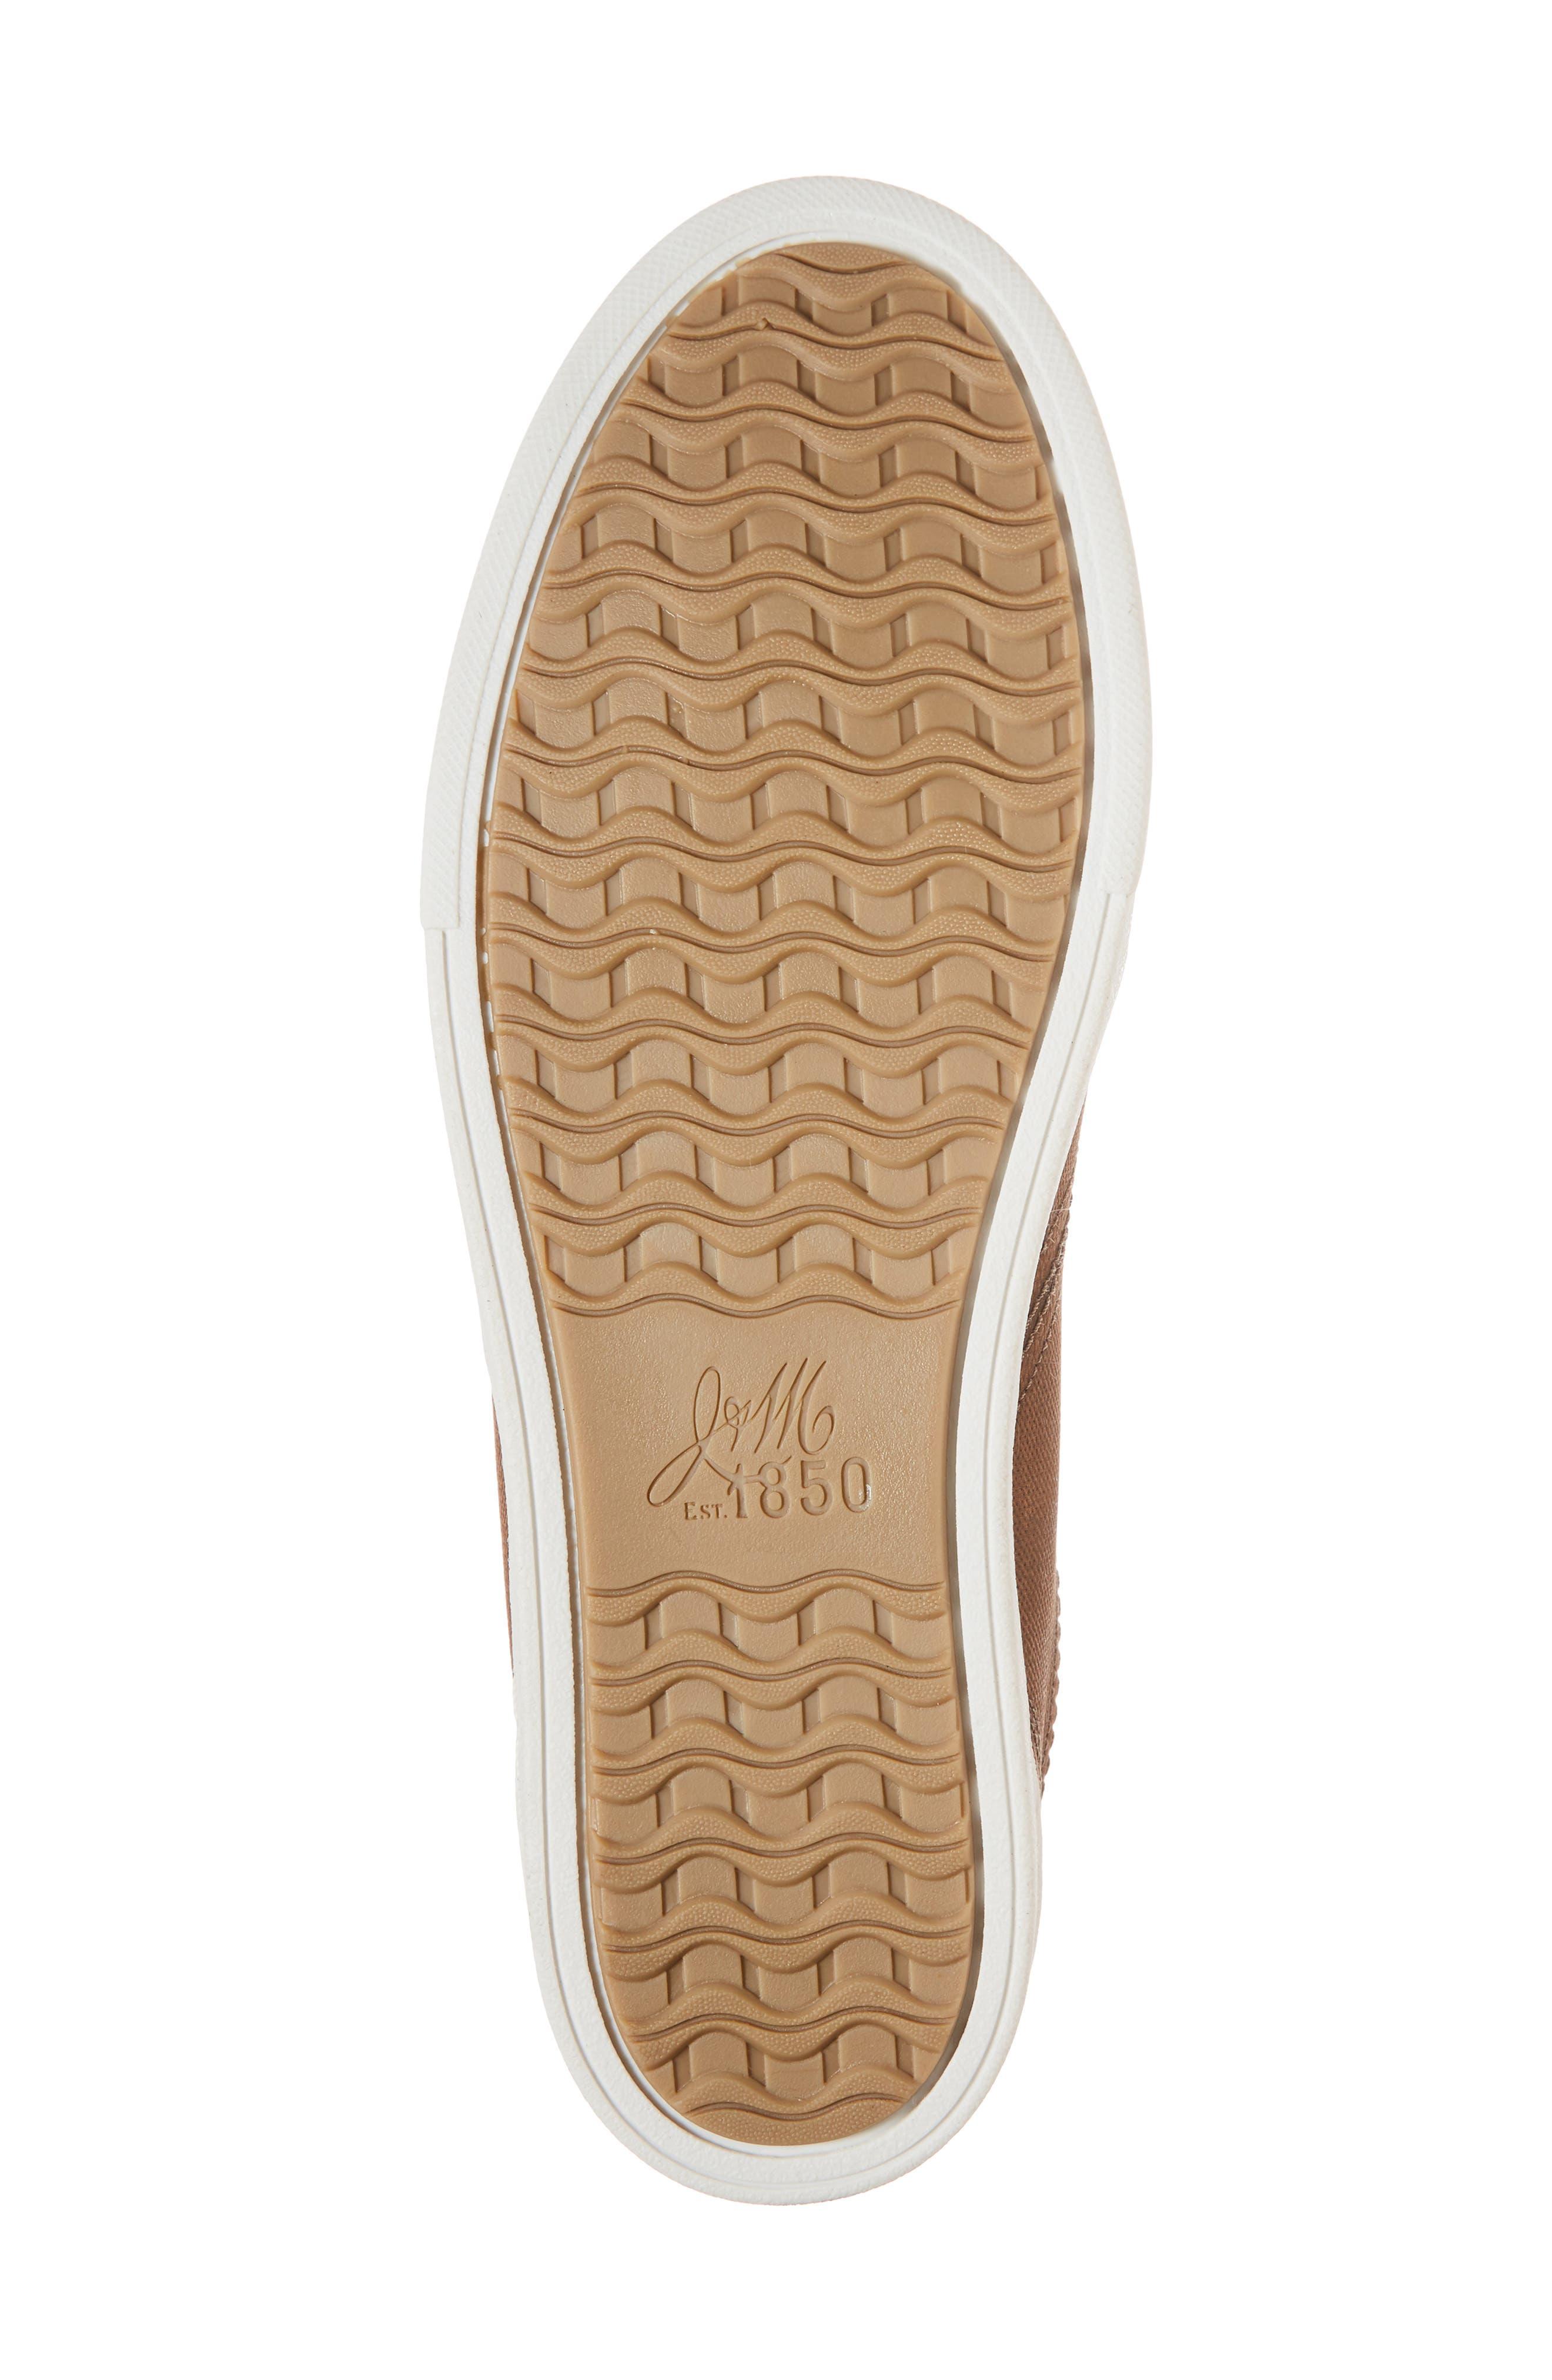 Quinton Textured Low Top Sneaker,                             Alternate thumbnail 6, color,                             Tan Leather